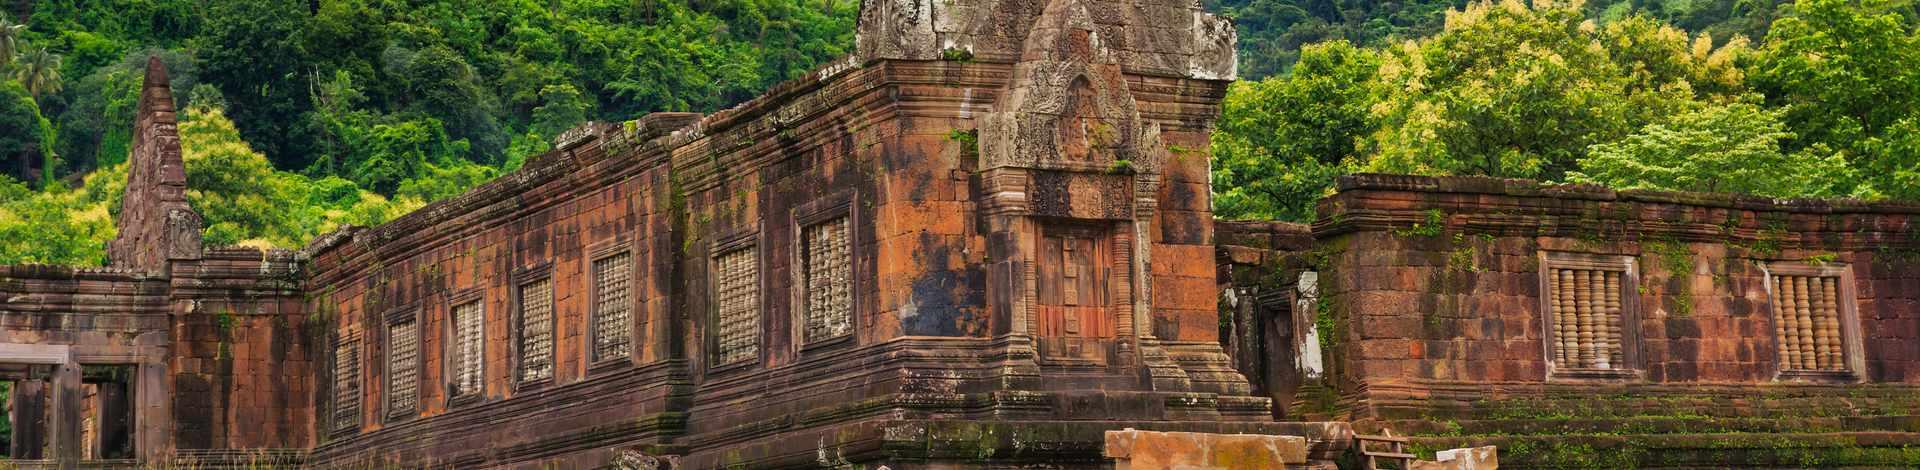 Temple Wat Phu Laos Champassak